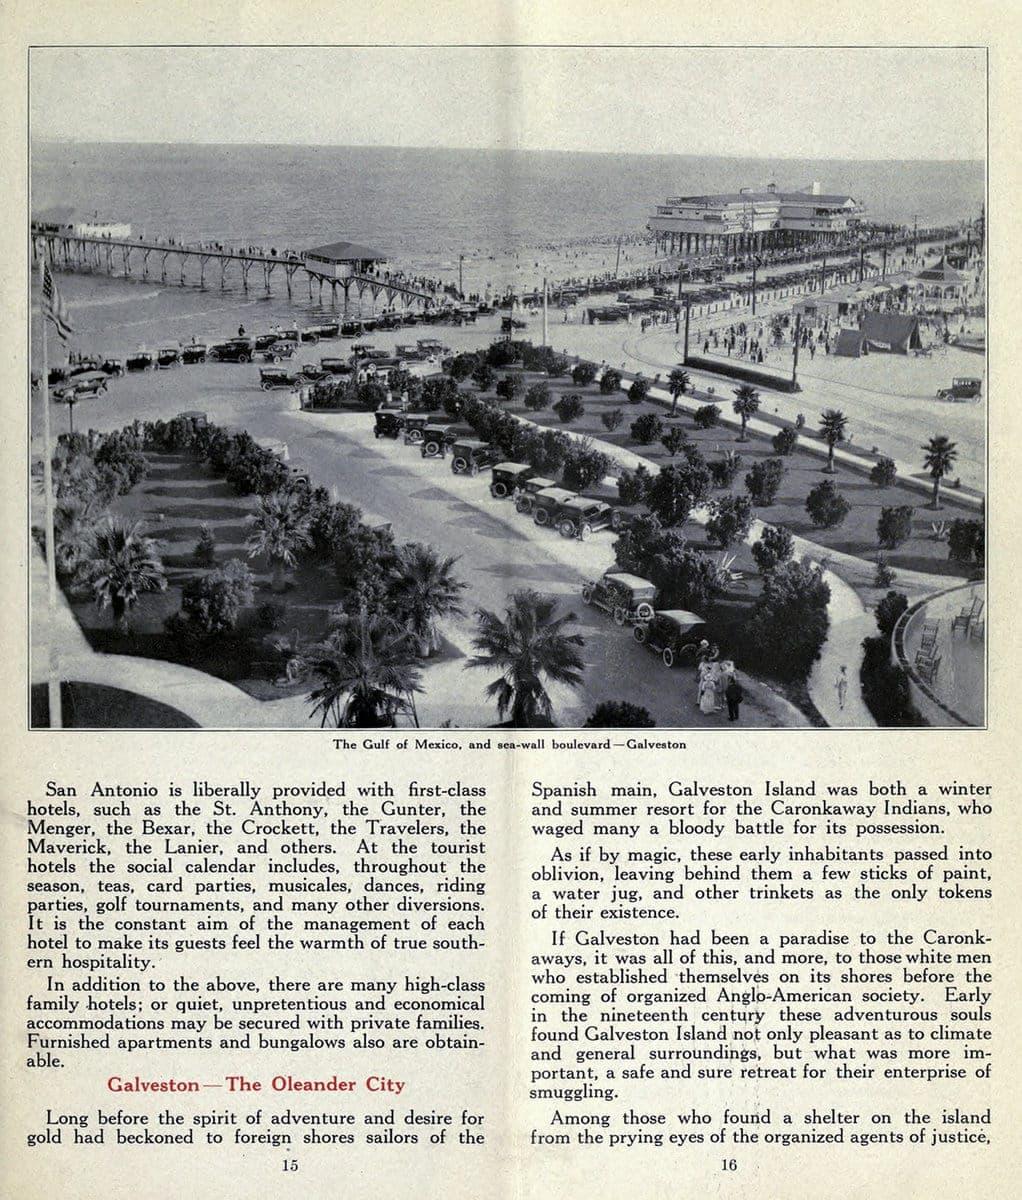 Galveston - The Oleander City